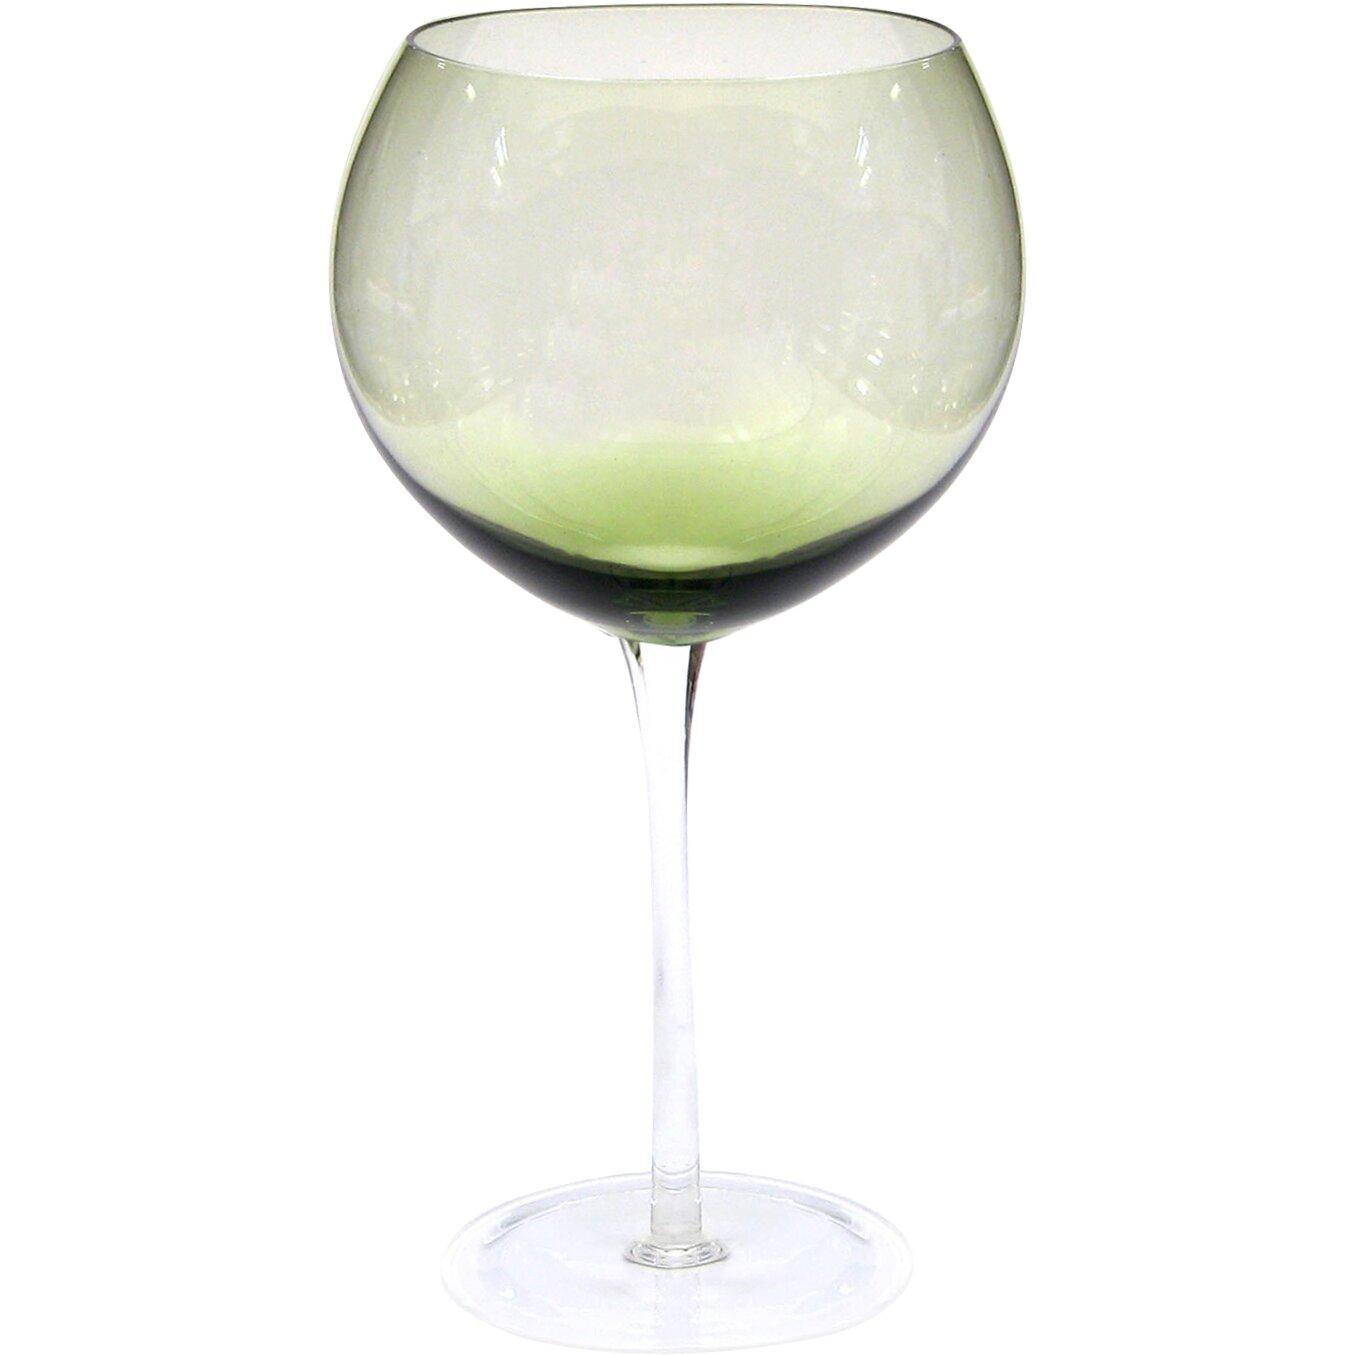 Home Decor Wayfair Certified International Glass Stemware 28 Oz Olive Green